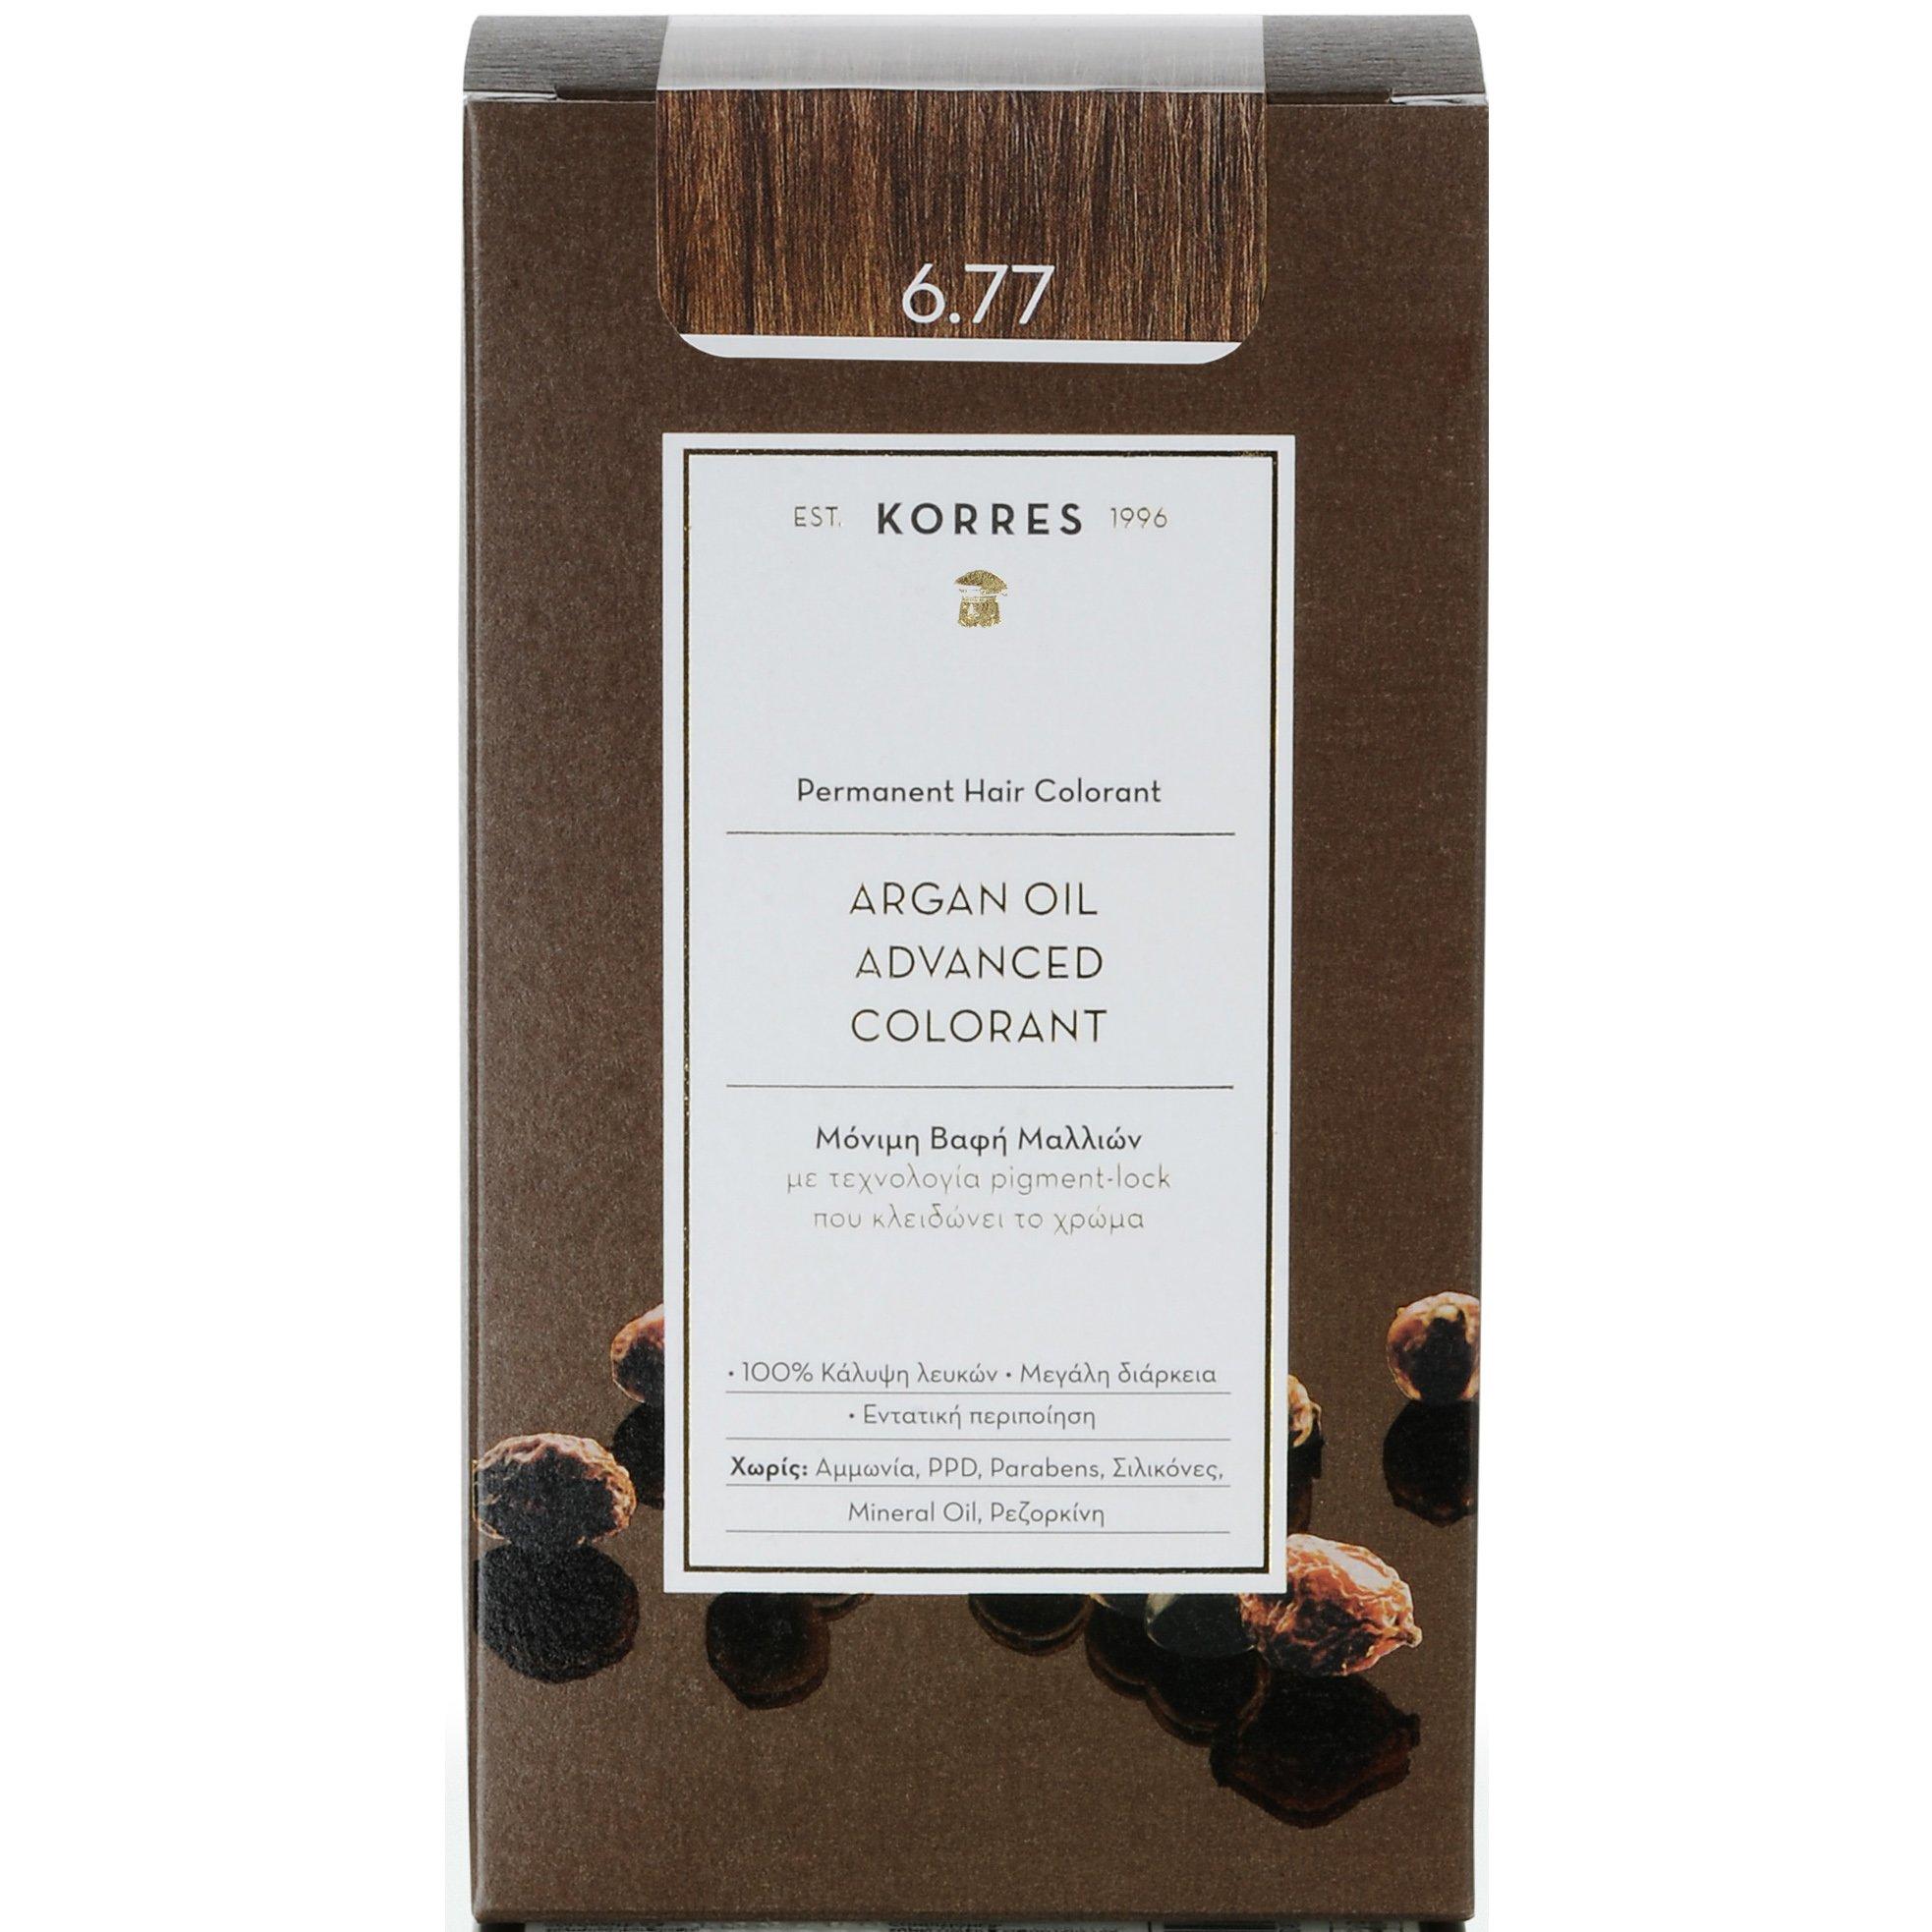 Korres Argan Oil Advanced Colorant Μόνιμη Βαφή Μαλλιών με Τεχνολογία Pigment-Lock που Κλειδώνει το Χρώμα 50ml – 6.77 ΠΡΑΛΙΝΑ